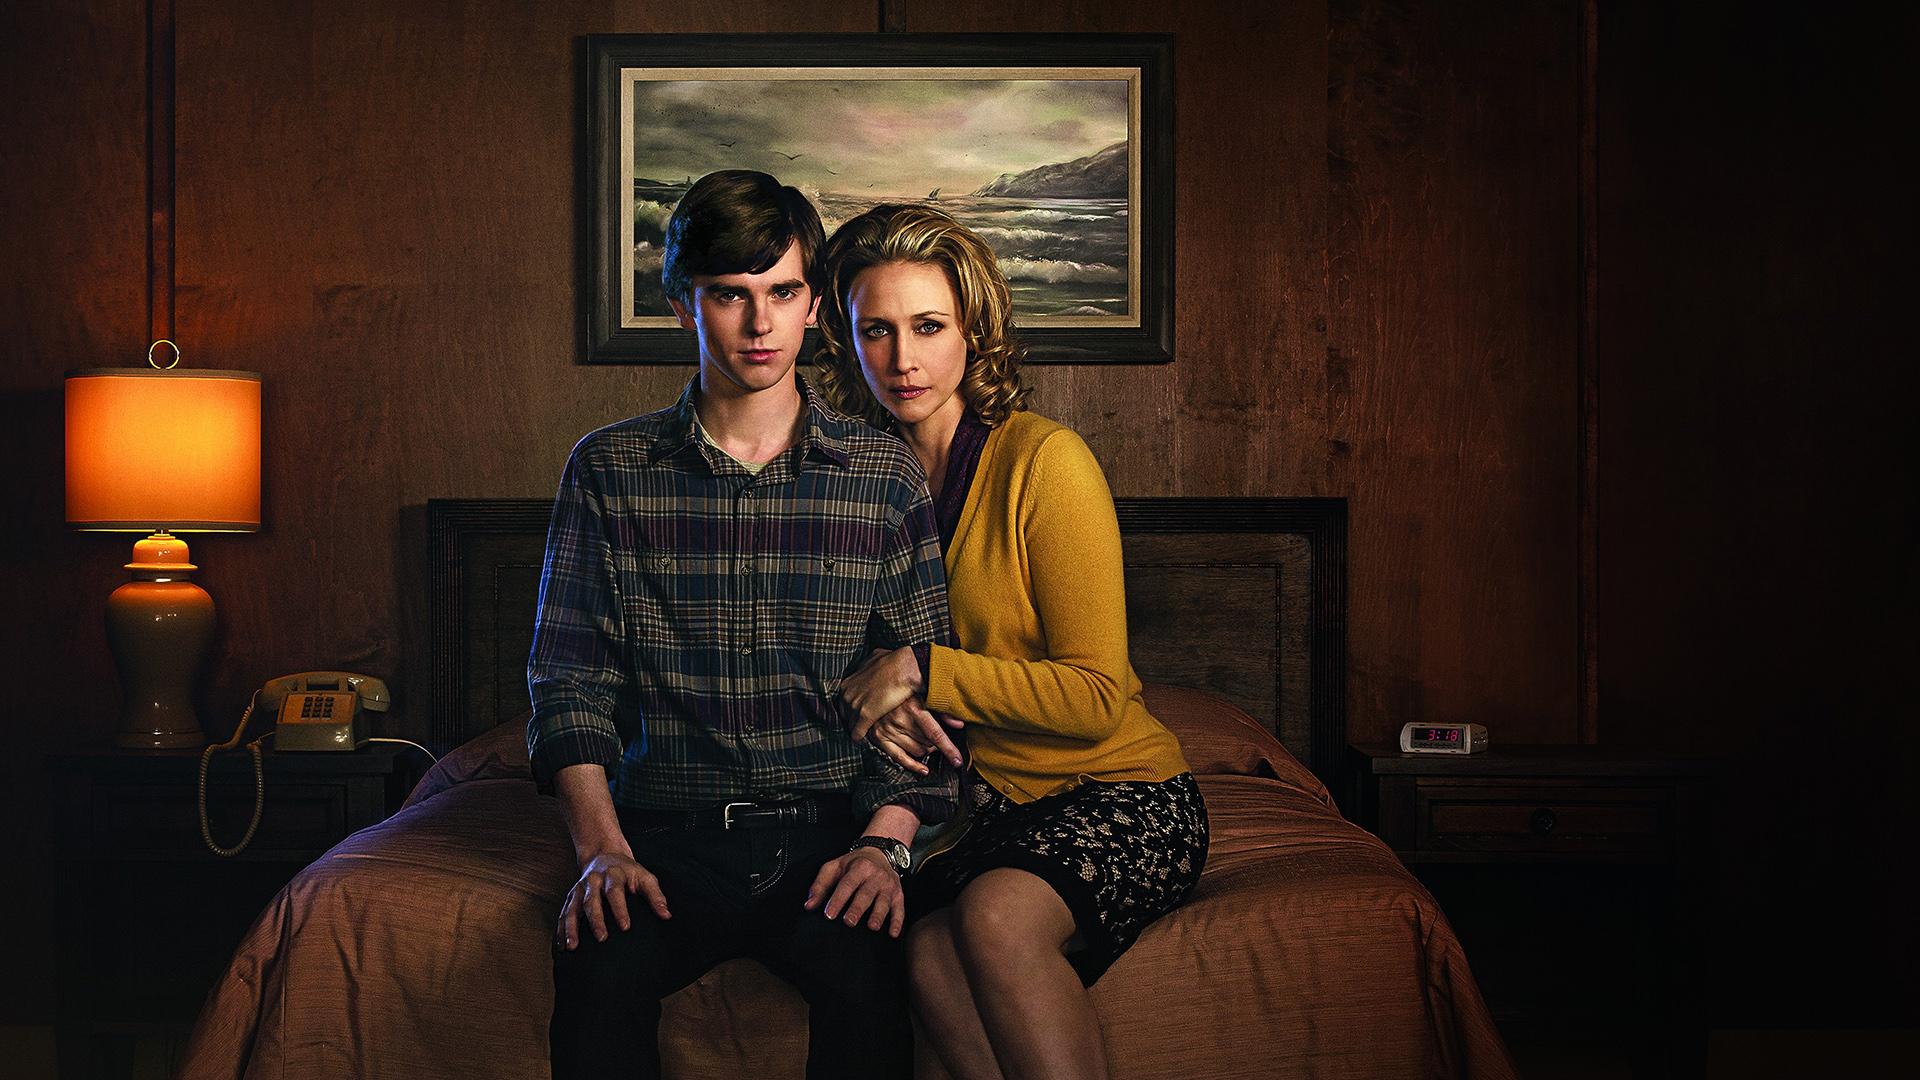 Catalogo Netflix Bates Motel